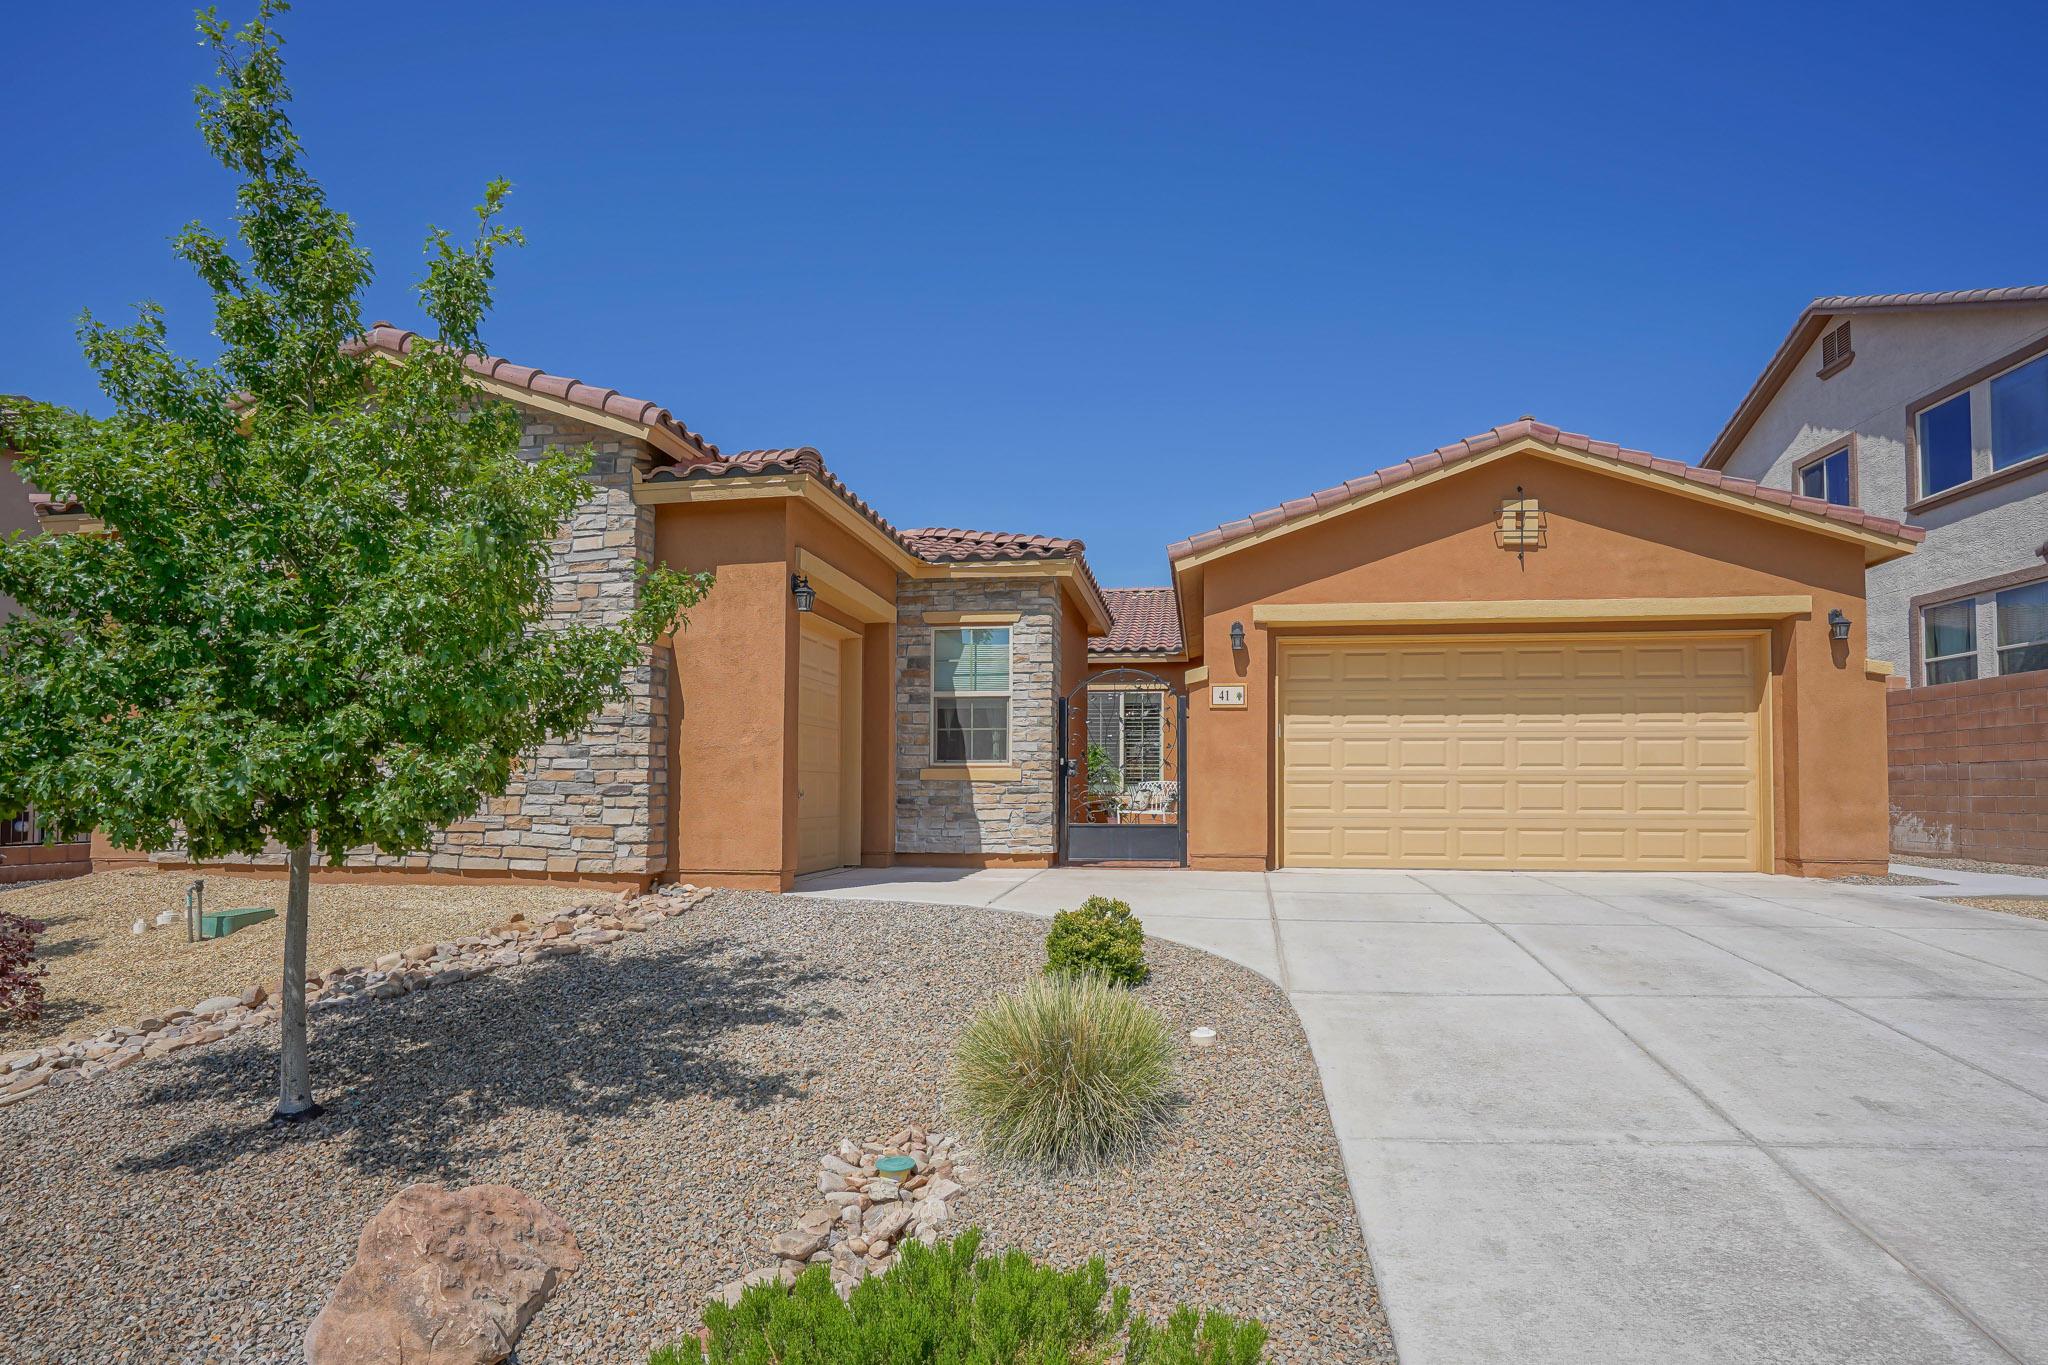 41 LOS BALCONES Place NE Property Photo - Rio Rancho, NM real estate listing